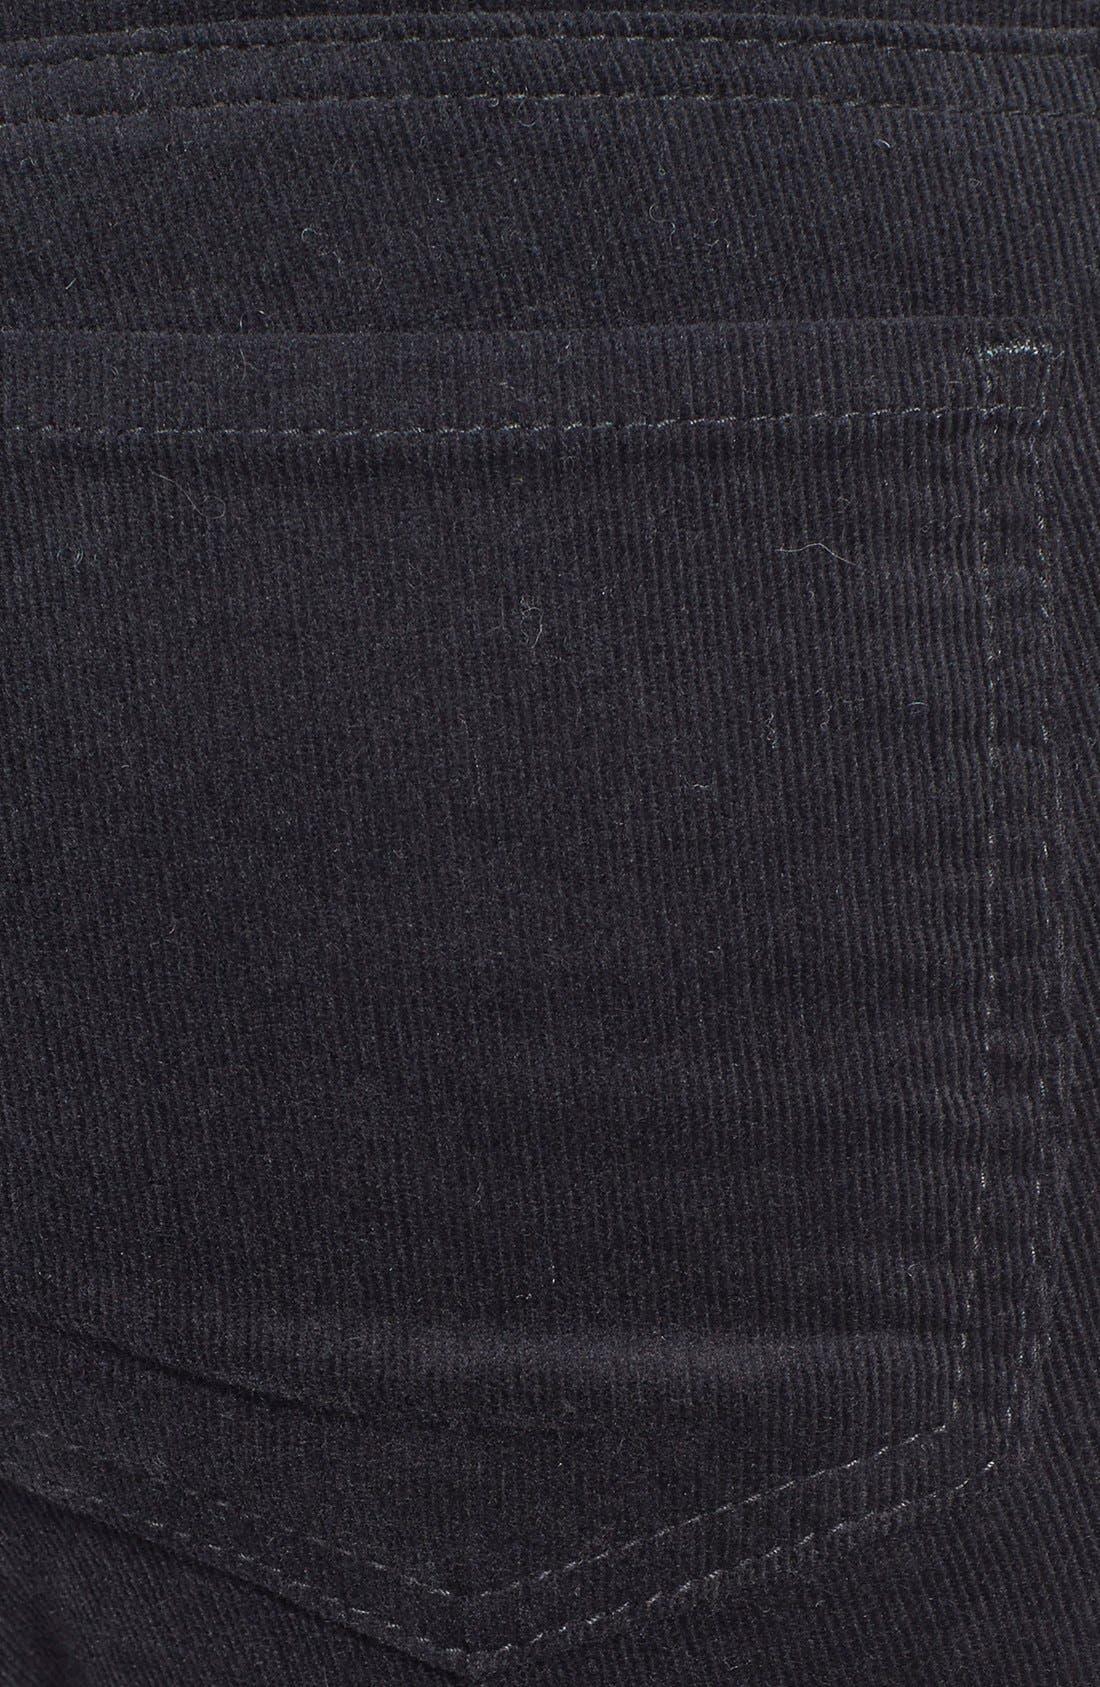 'Diana' Stretch Corduroy Skinny Pants,                             Alternate thumbnail 174, color,